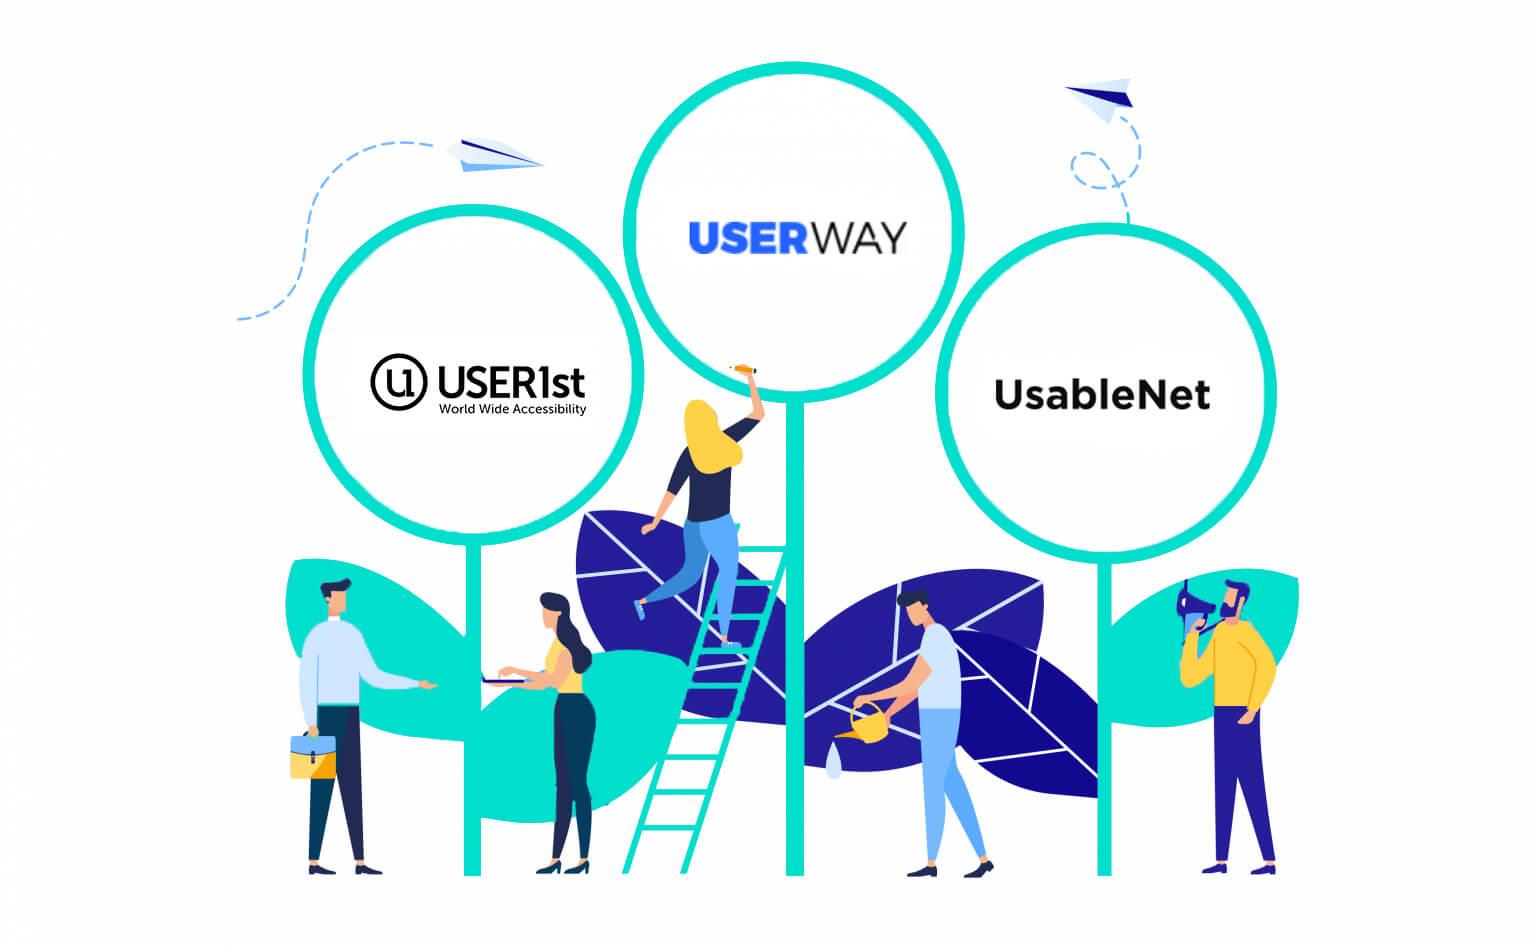 User1st Userway Usablenet confronto